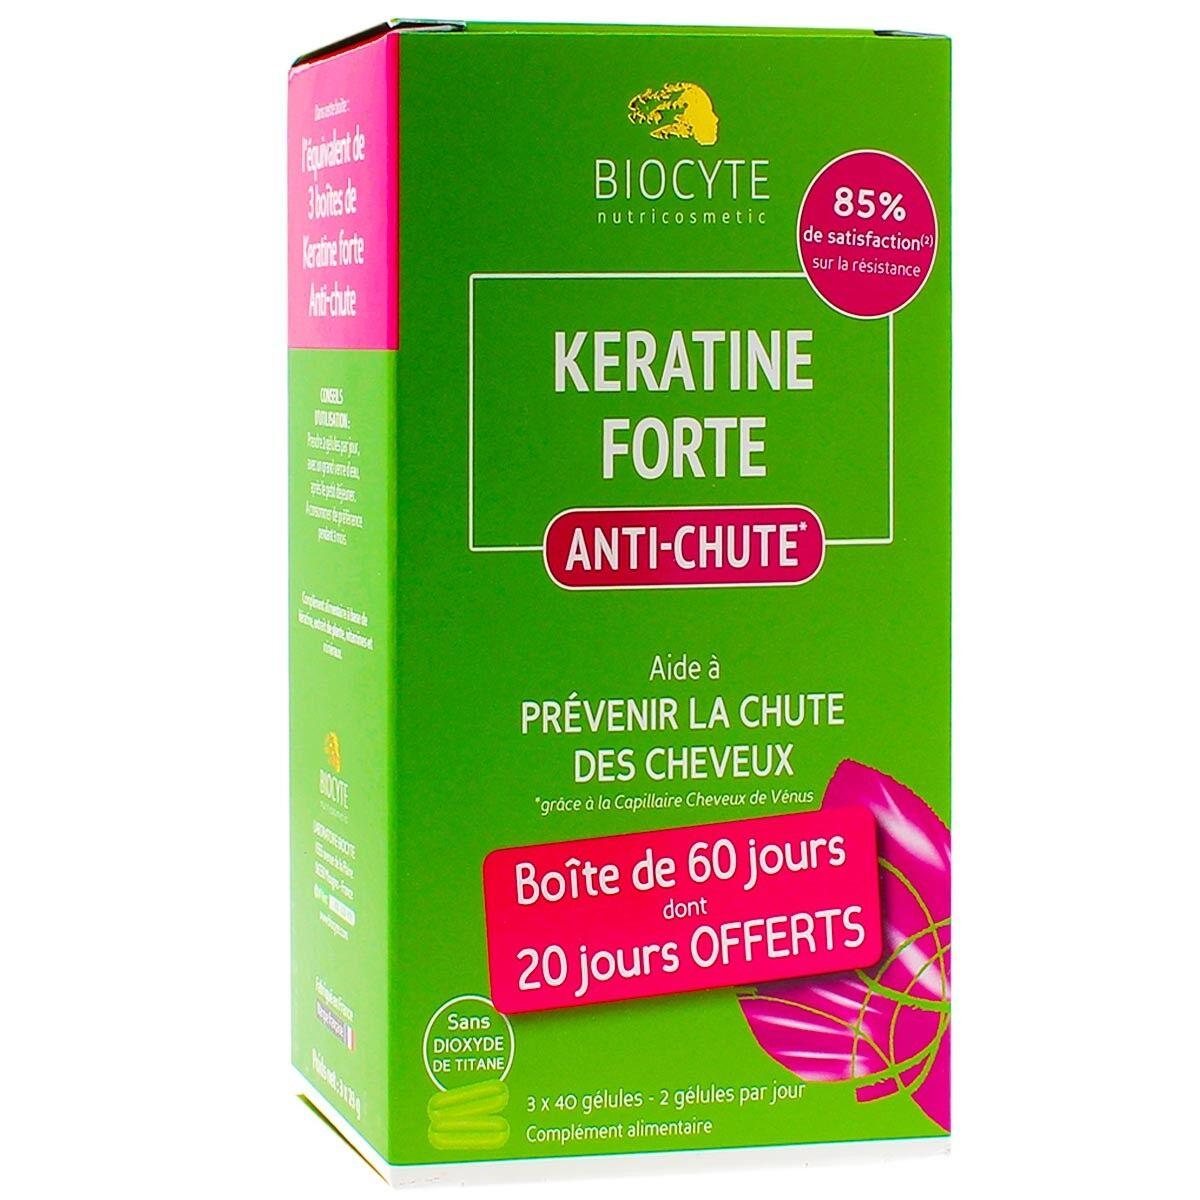 Biocyte keratine forte anti-chute 3x40 gelules